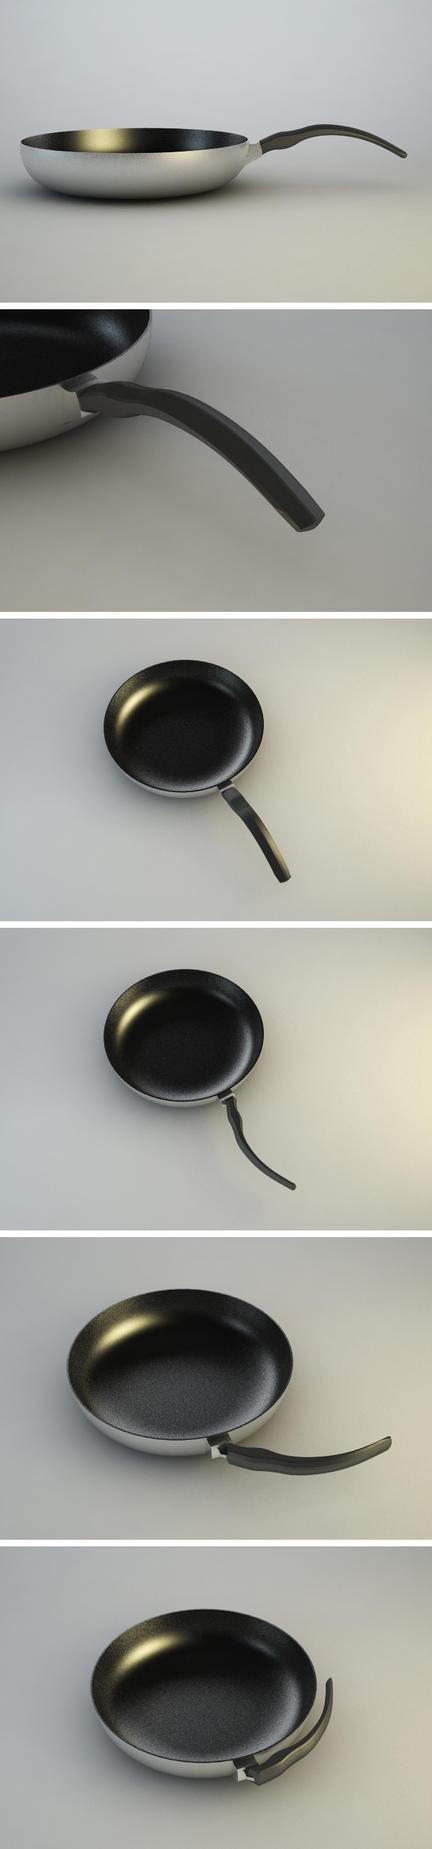 Tava tasarimi  Pan design 1 by cihanYILDIZ